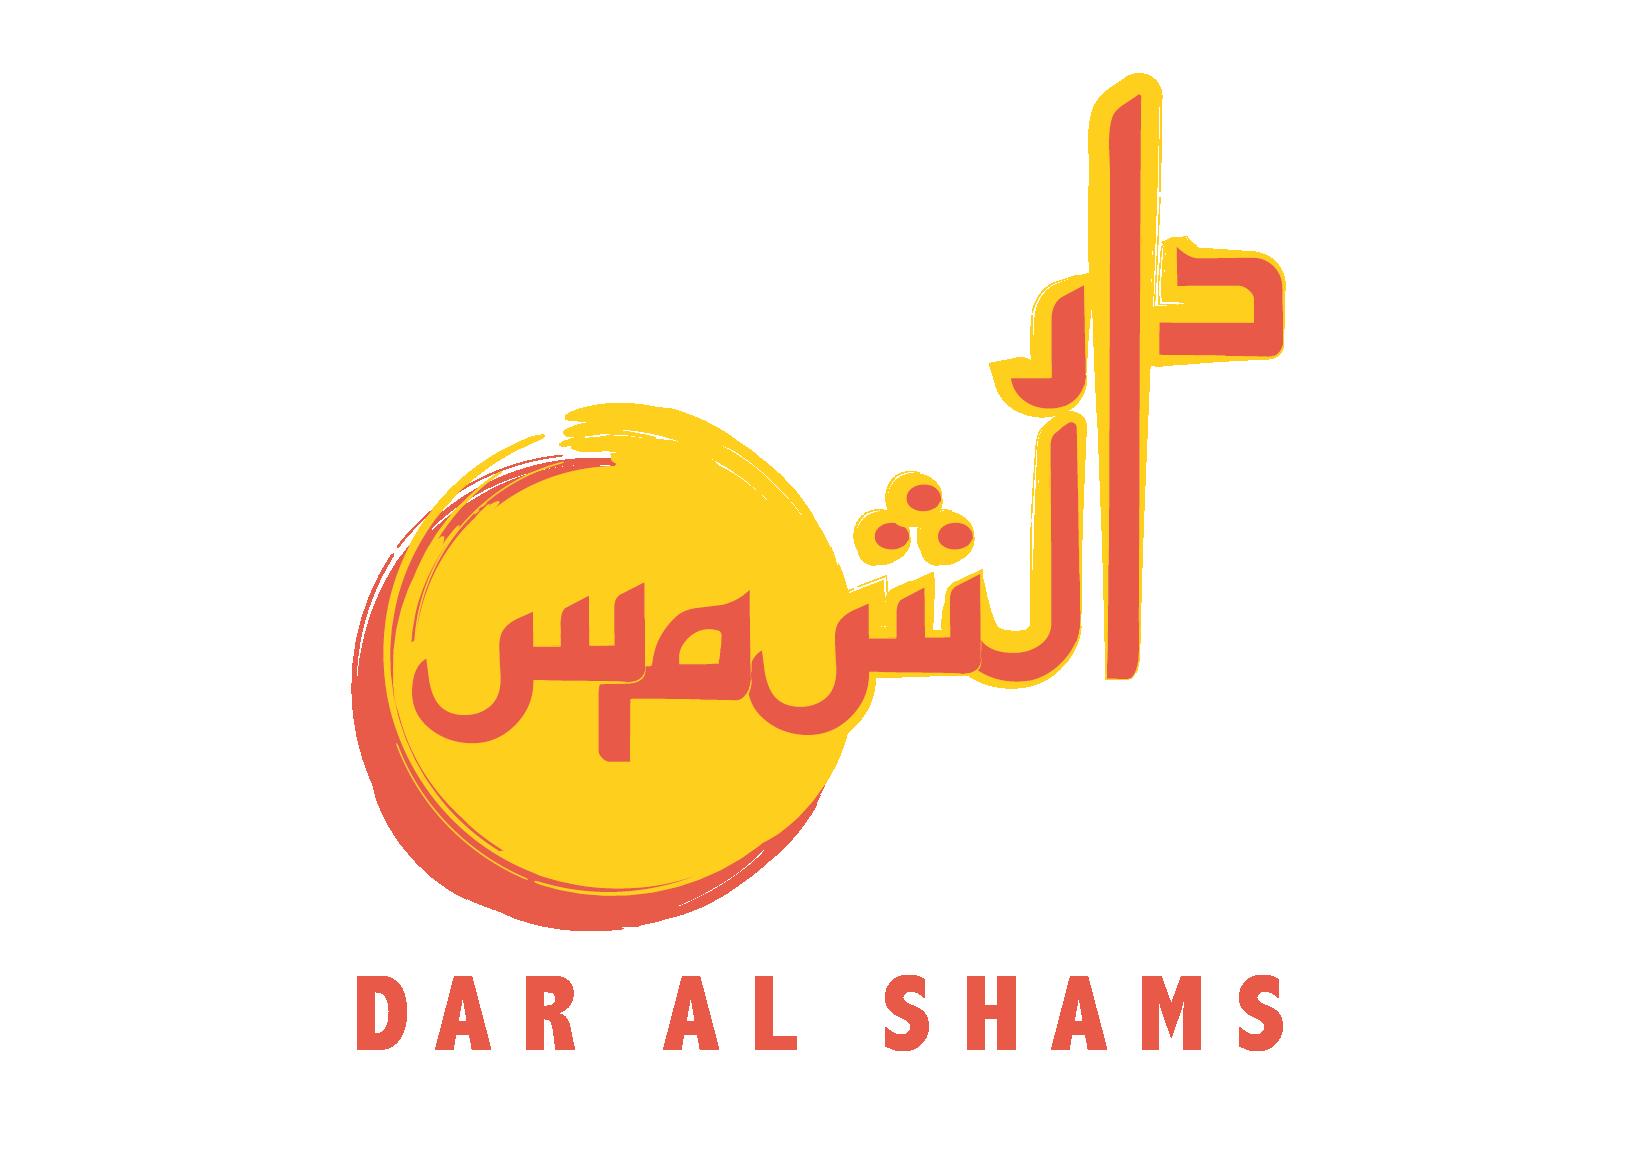 logo_Dar al Shams_final-01.png